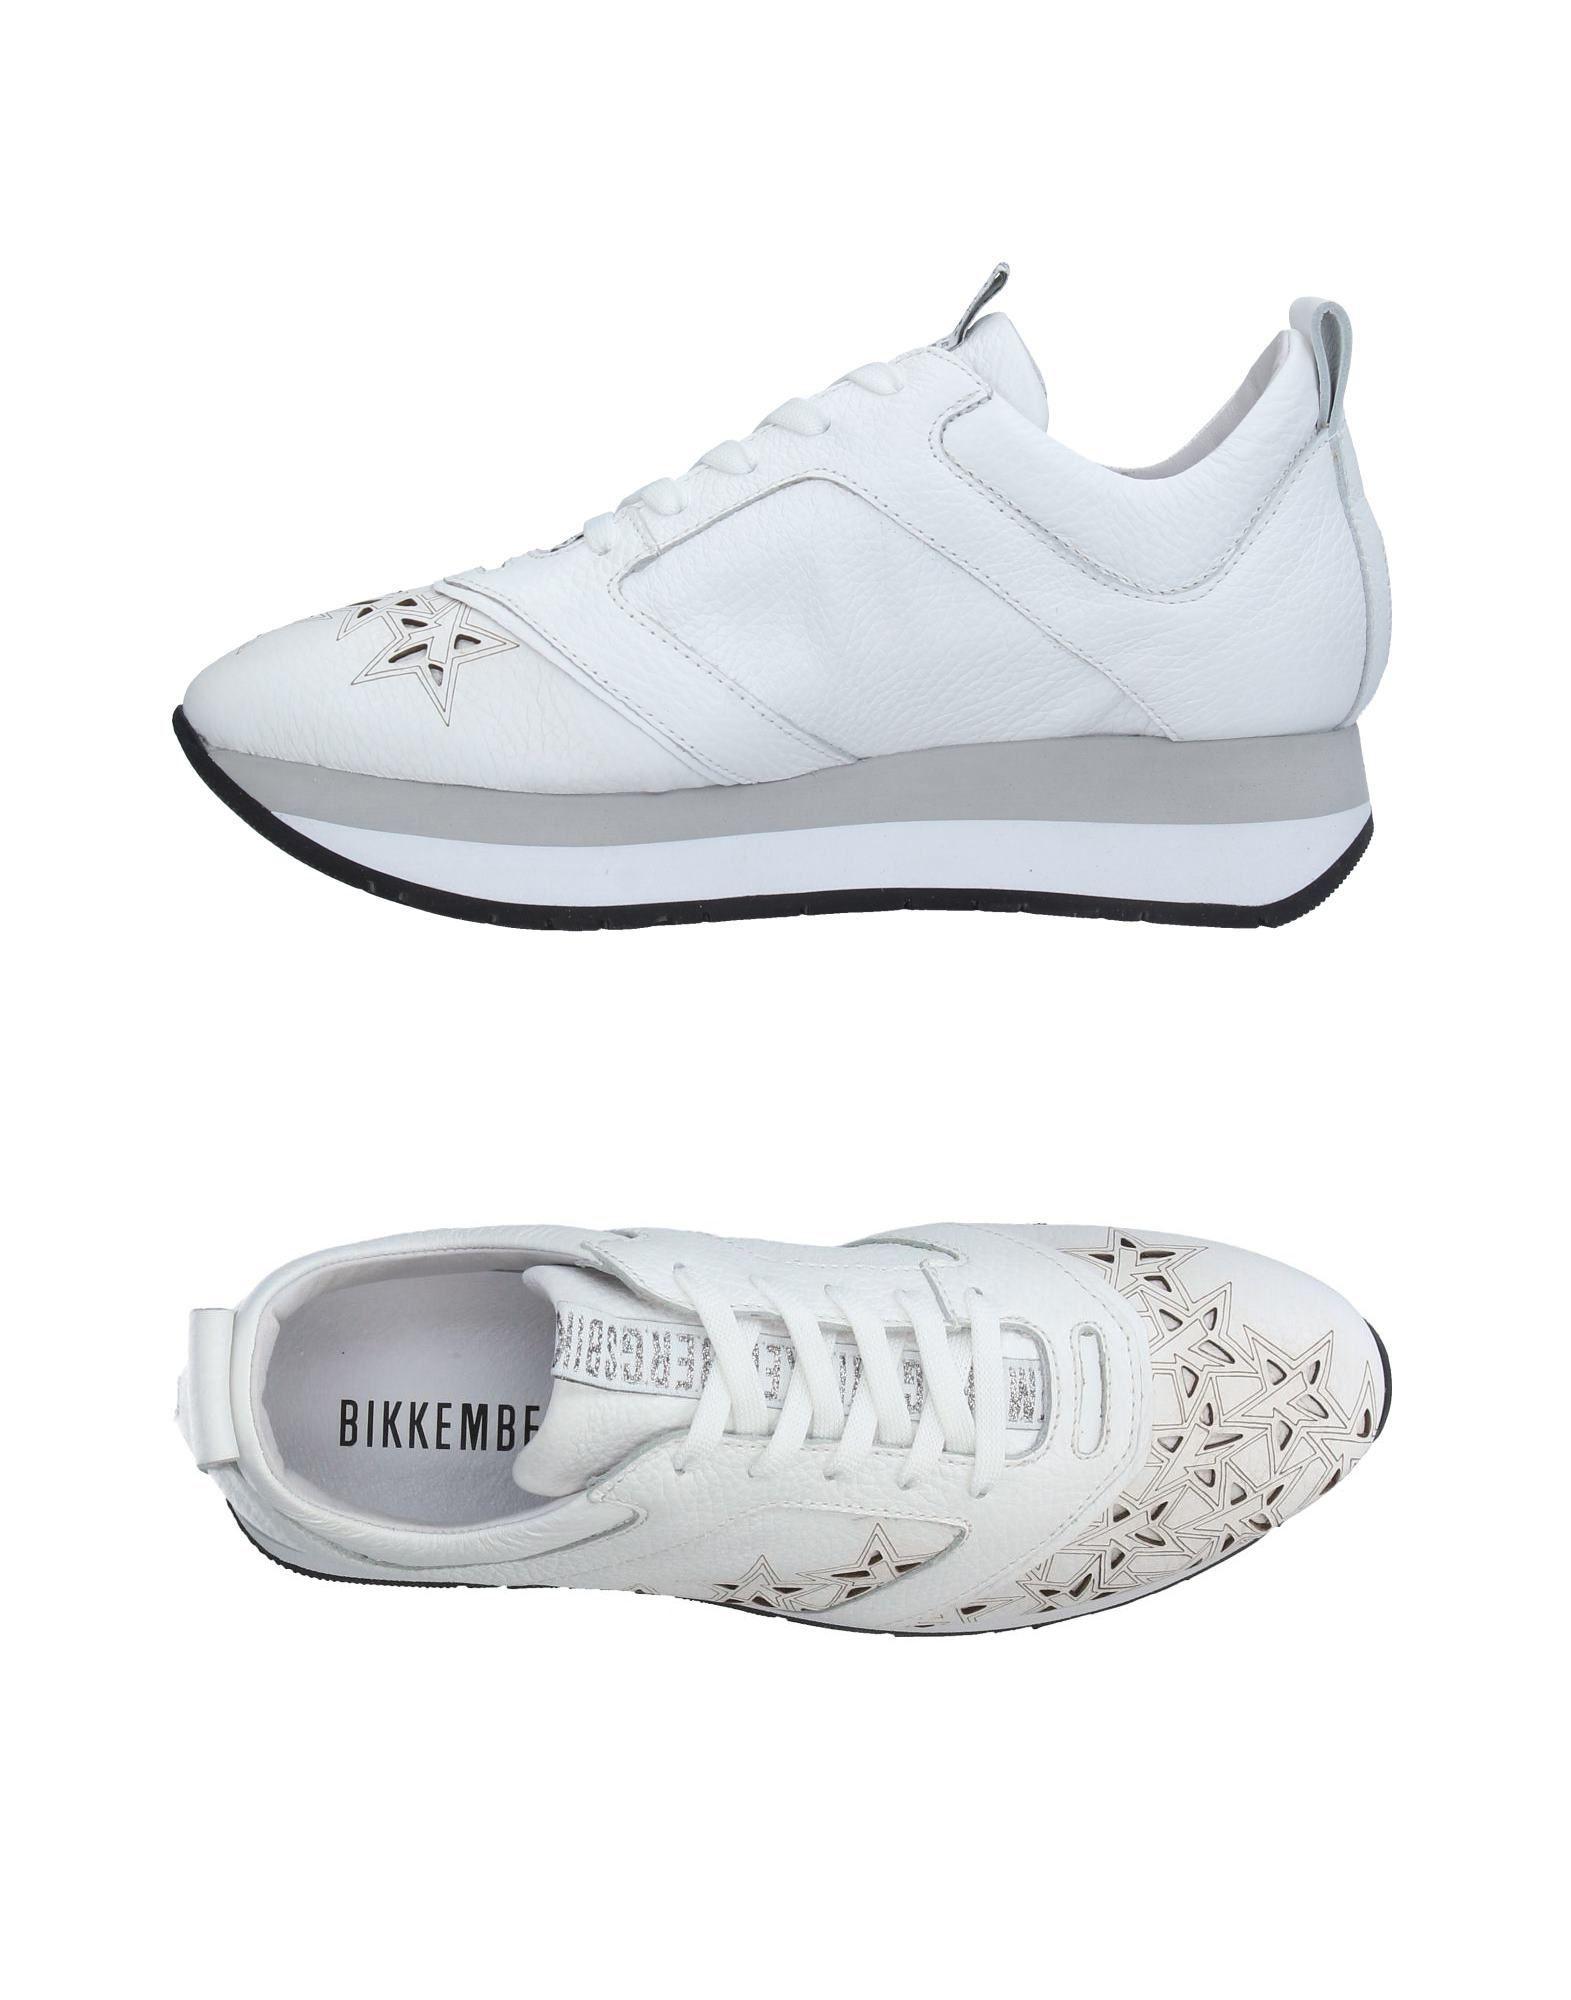 Zapatillas Bikkembergs Bikkembergs Zapatillas Mujer - Zapatillas Bikkembergs  Blanco fabe50